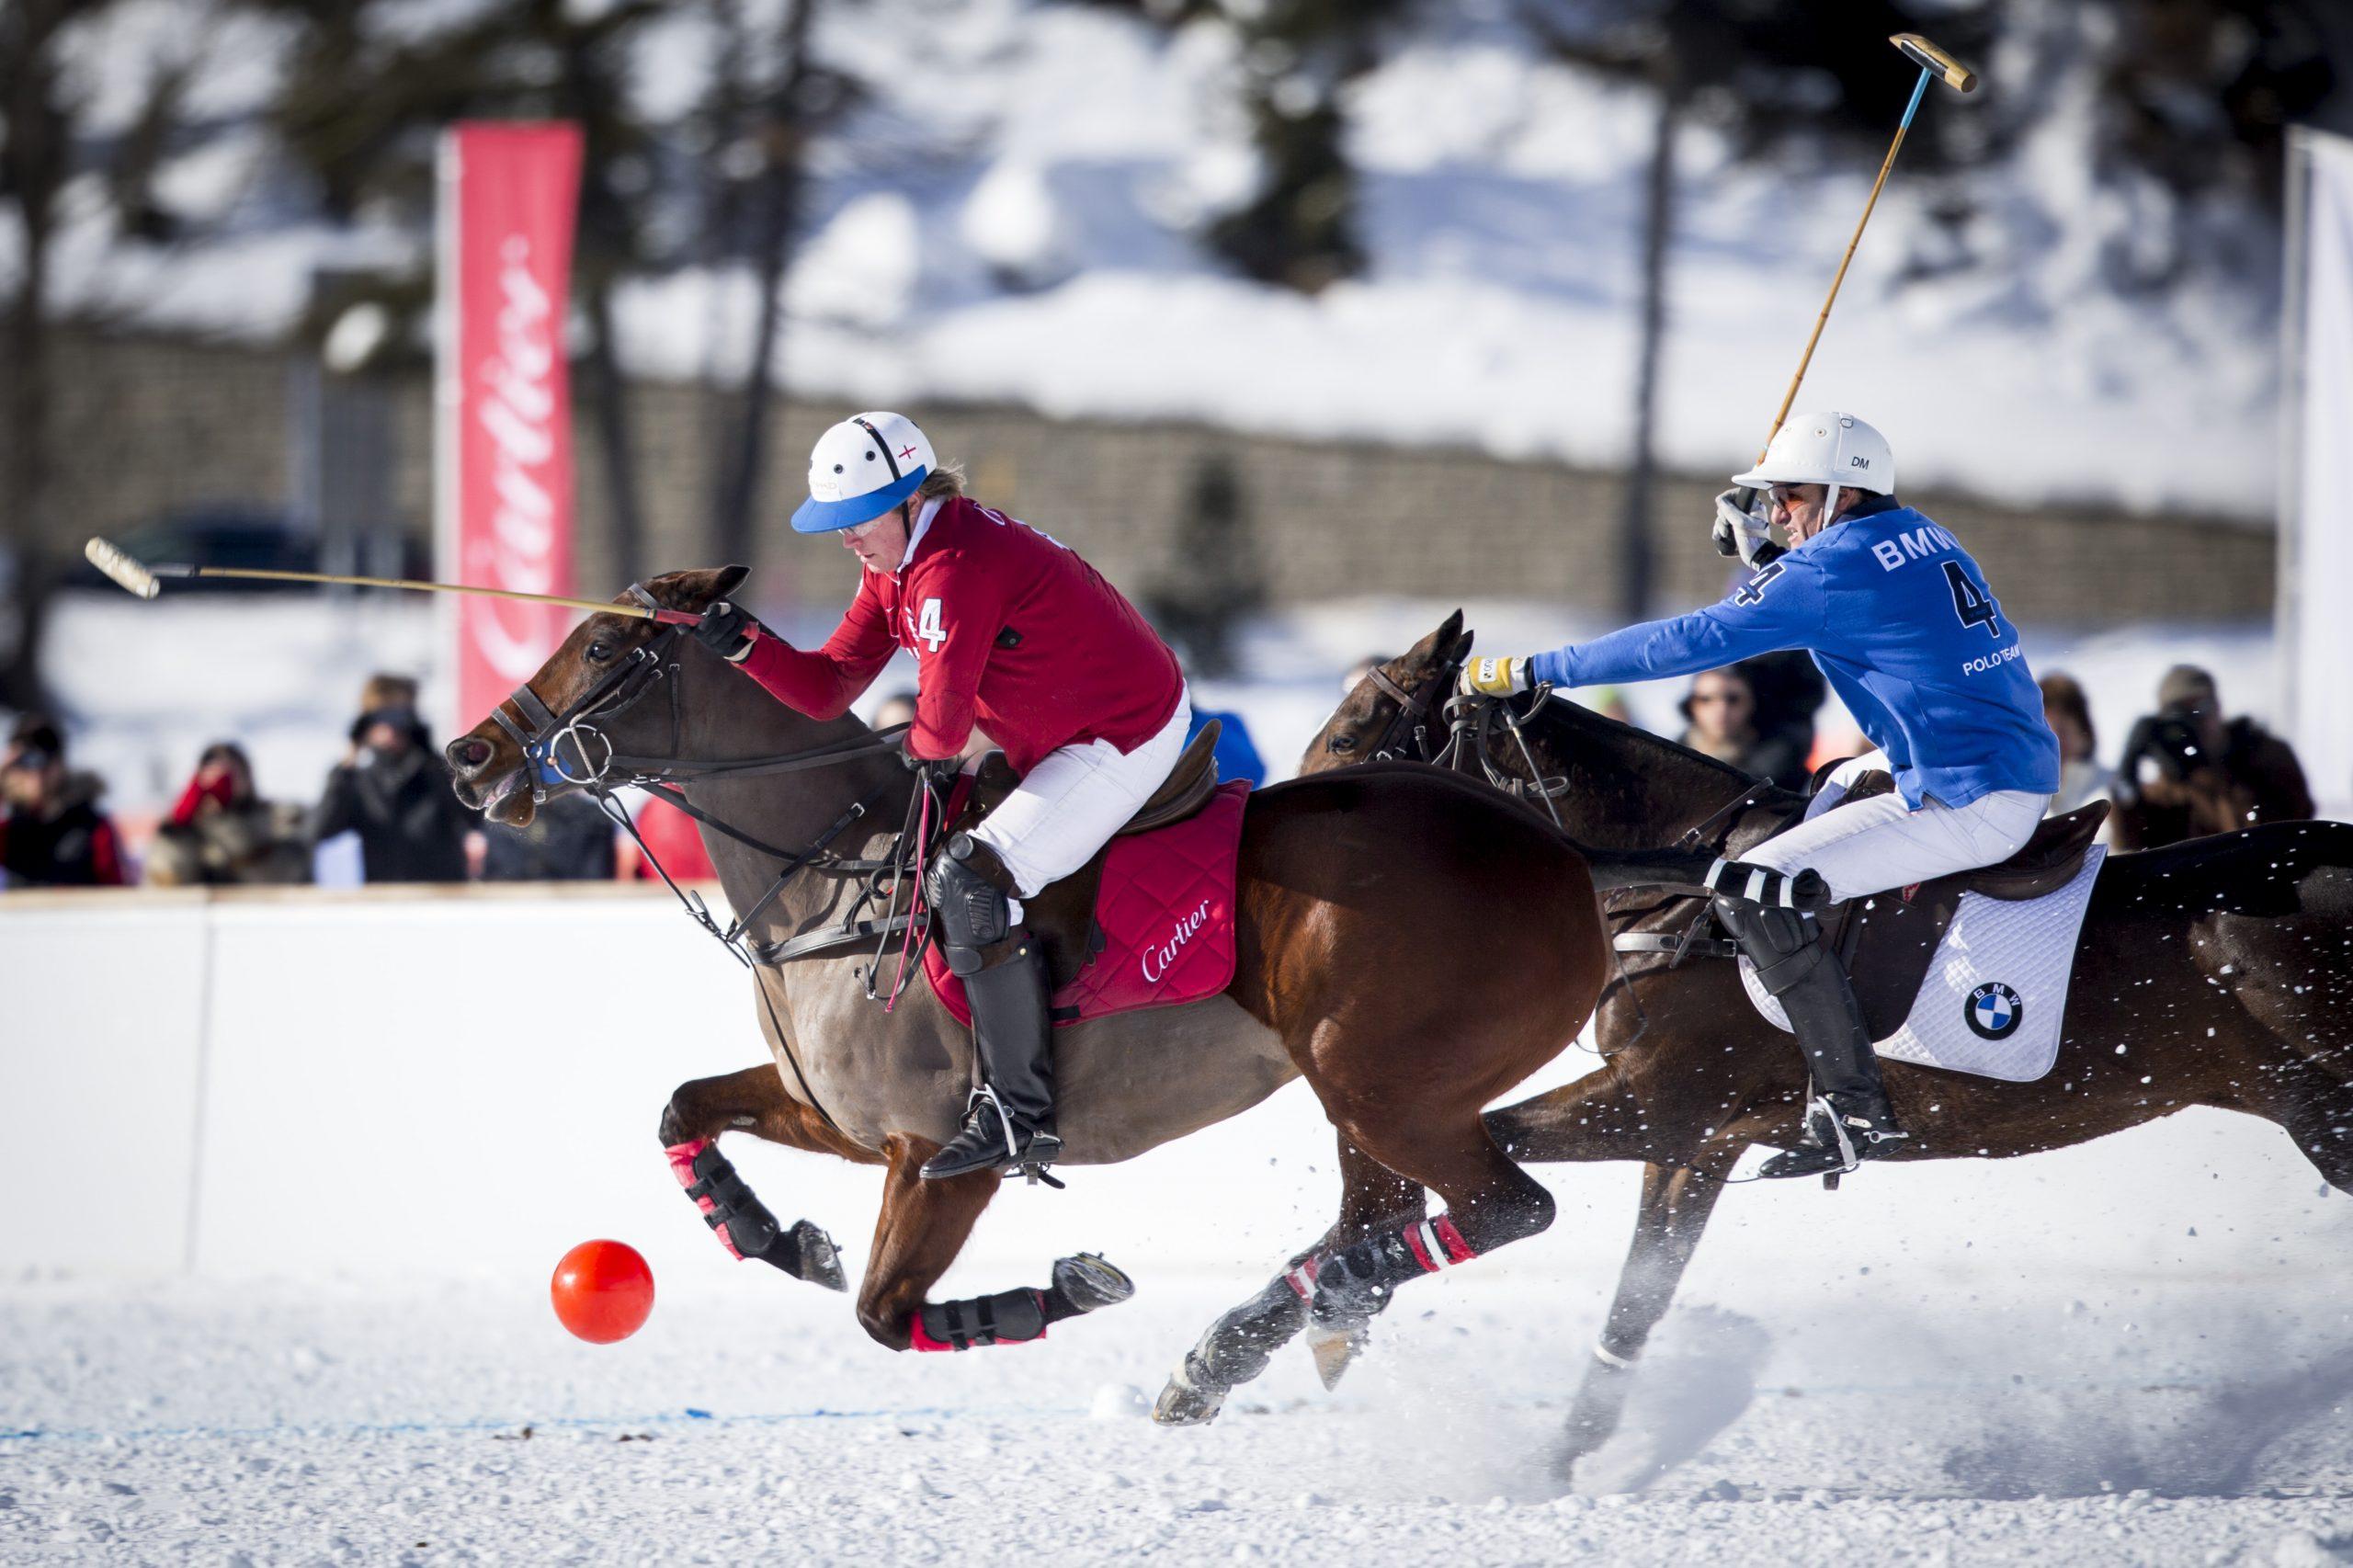 deportes ski